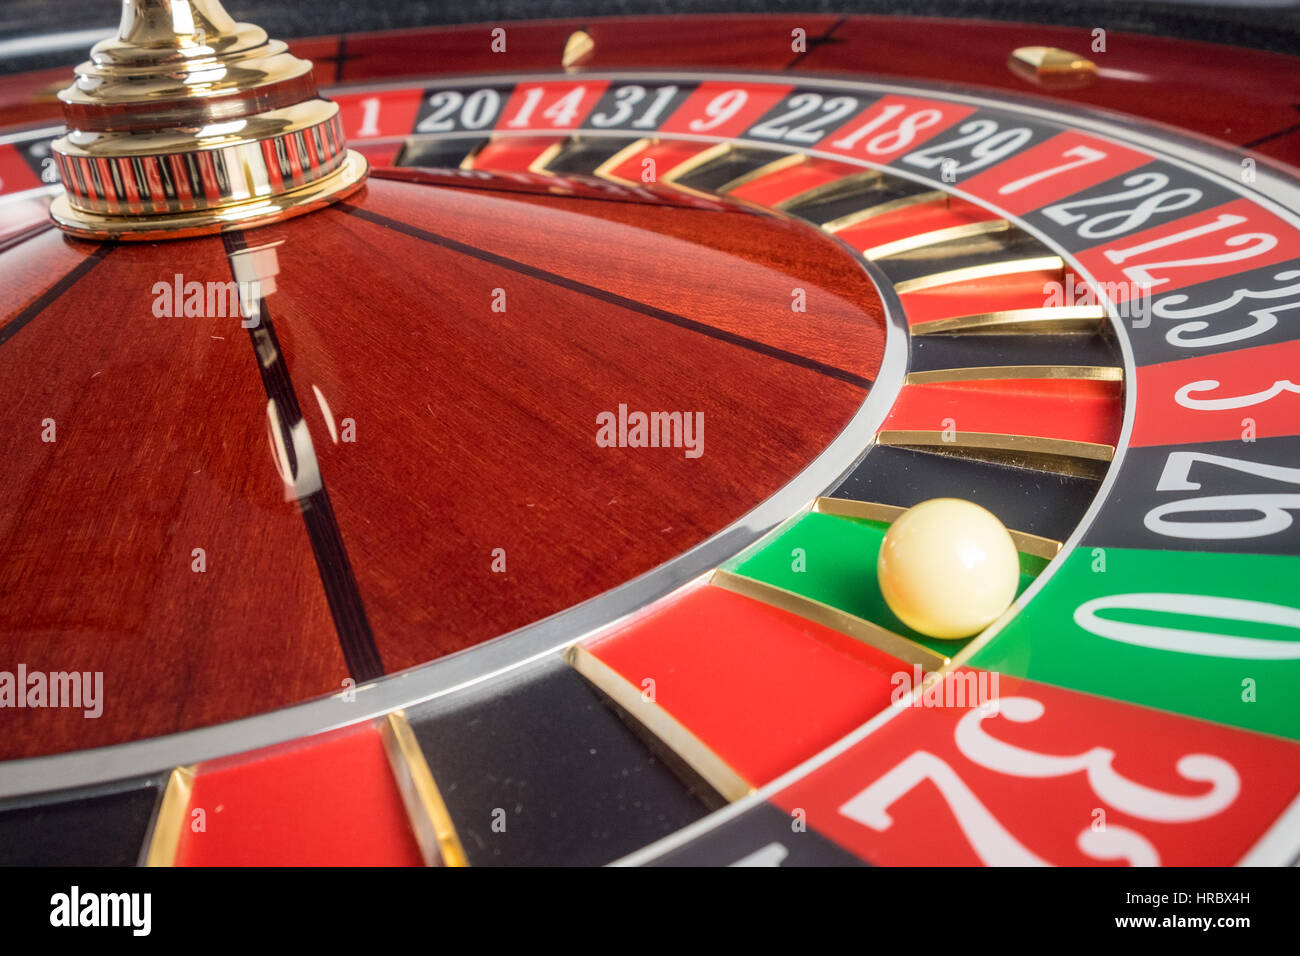 Casino Roulette Wheel stopped at zero - Stock Image